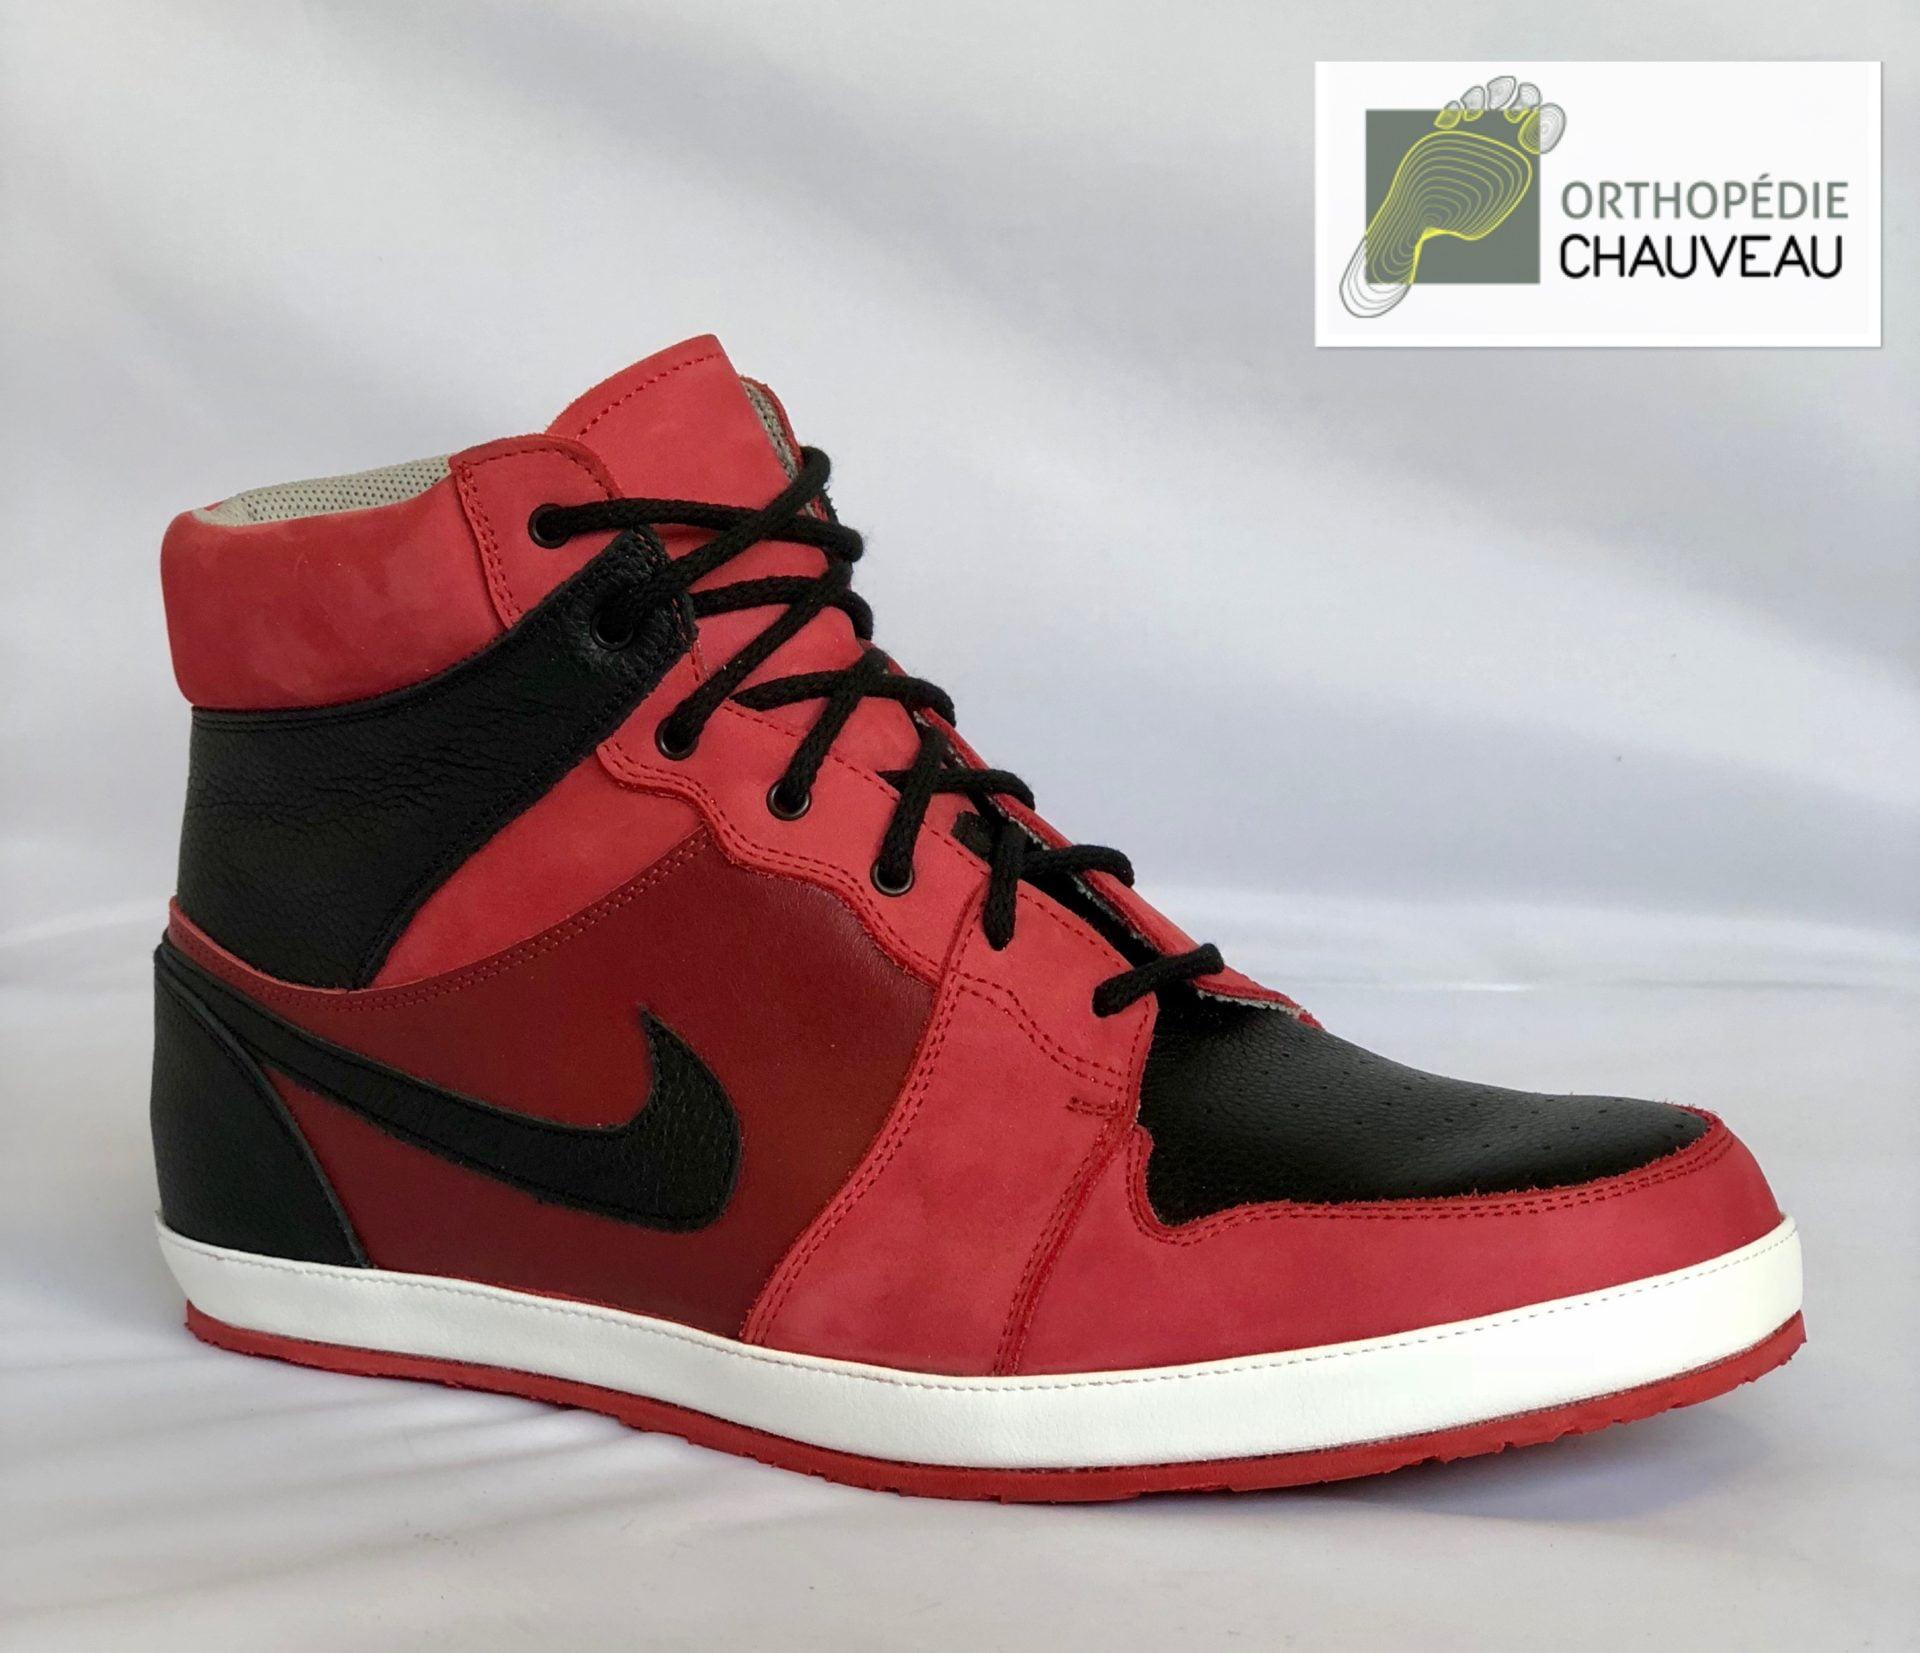 chaussures sur mesure rennes st malo nike rouge